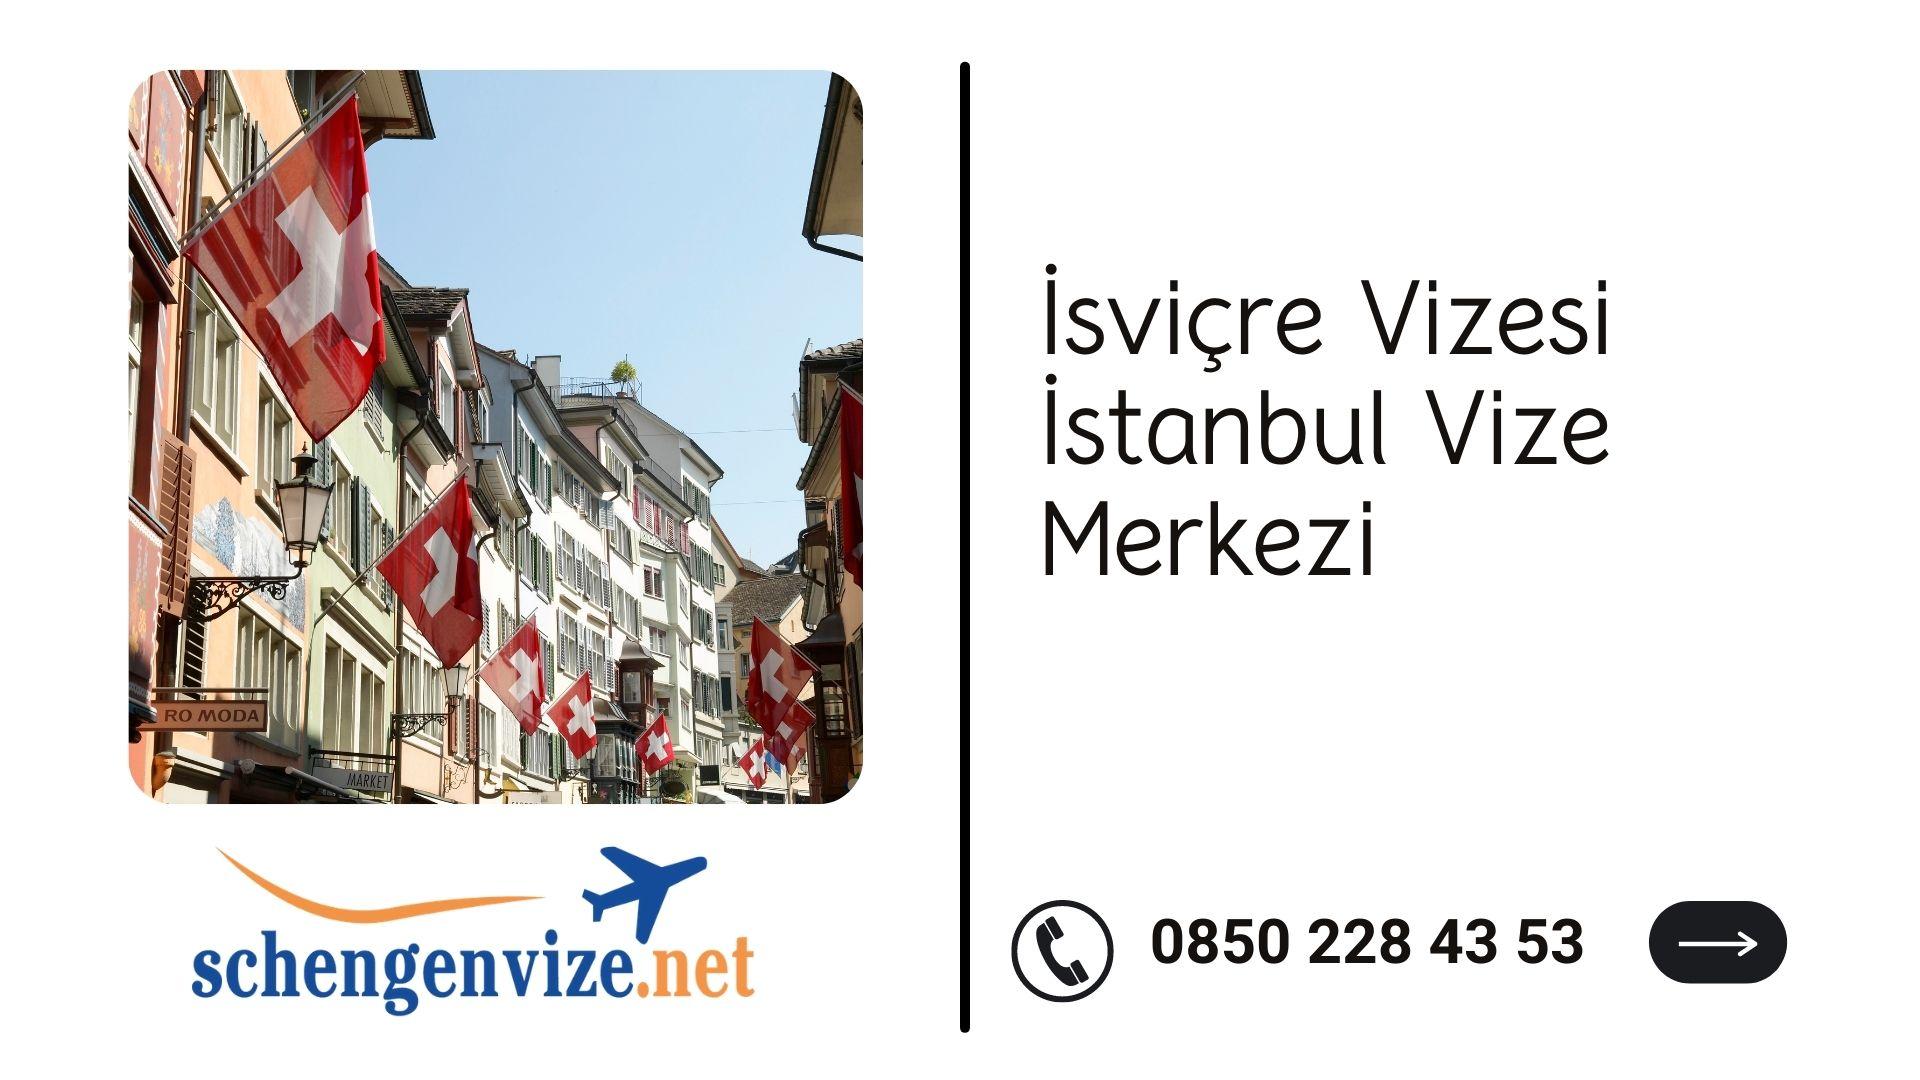 İsviçre Vizesi İstanbul Vize Merkezi